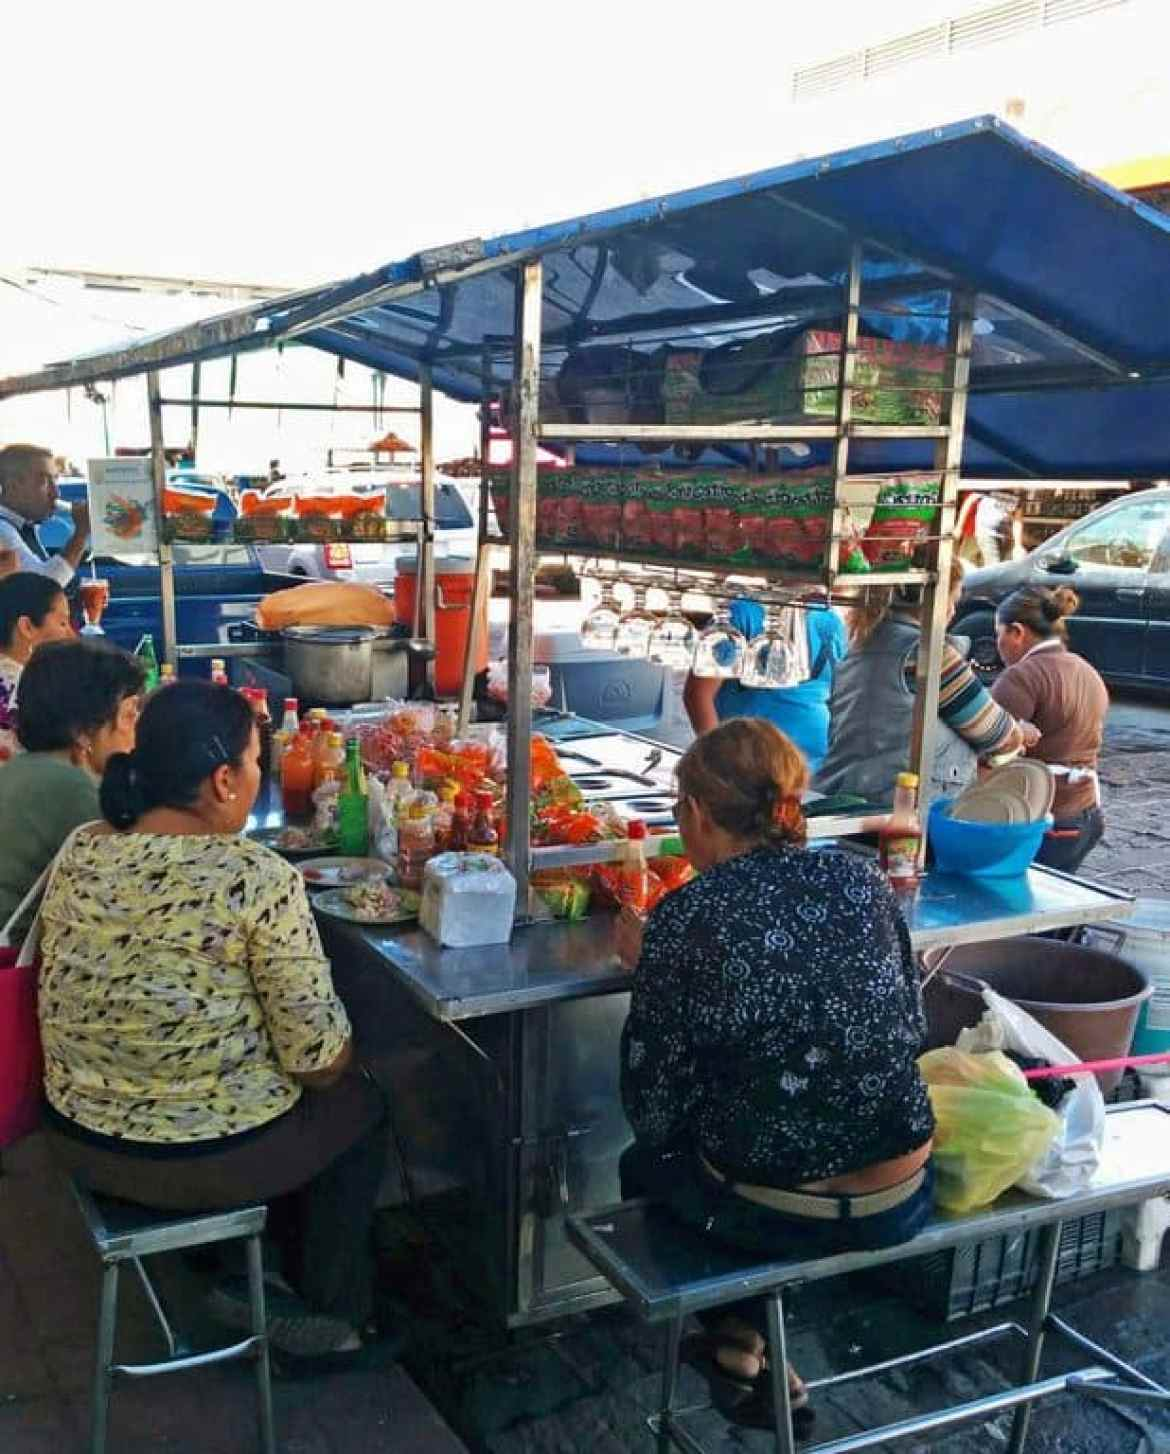 Busy Street Food Stand in Mazatlan